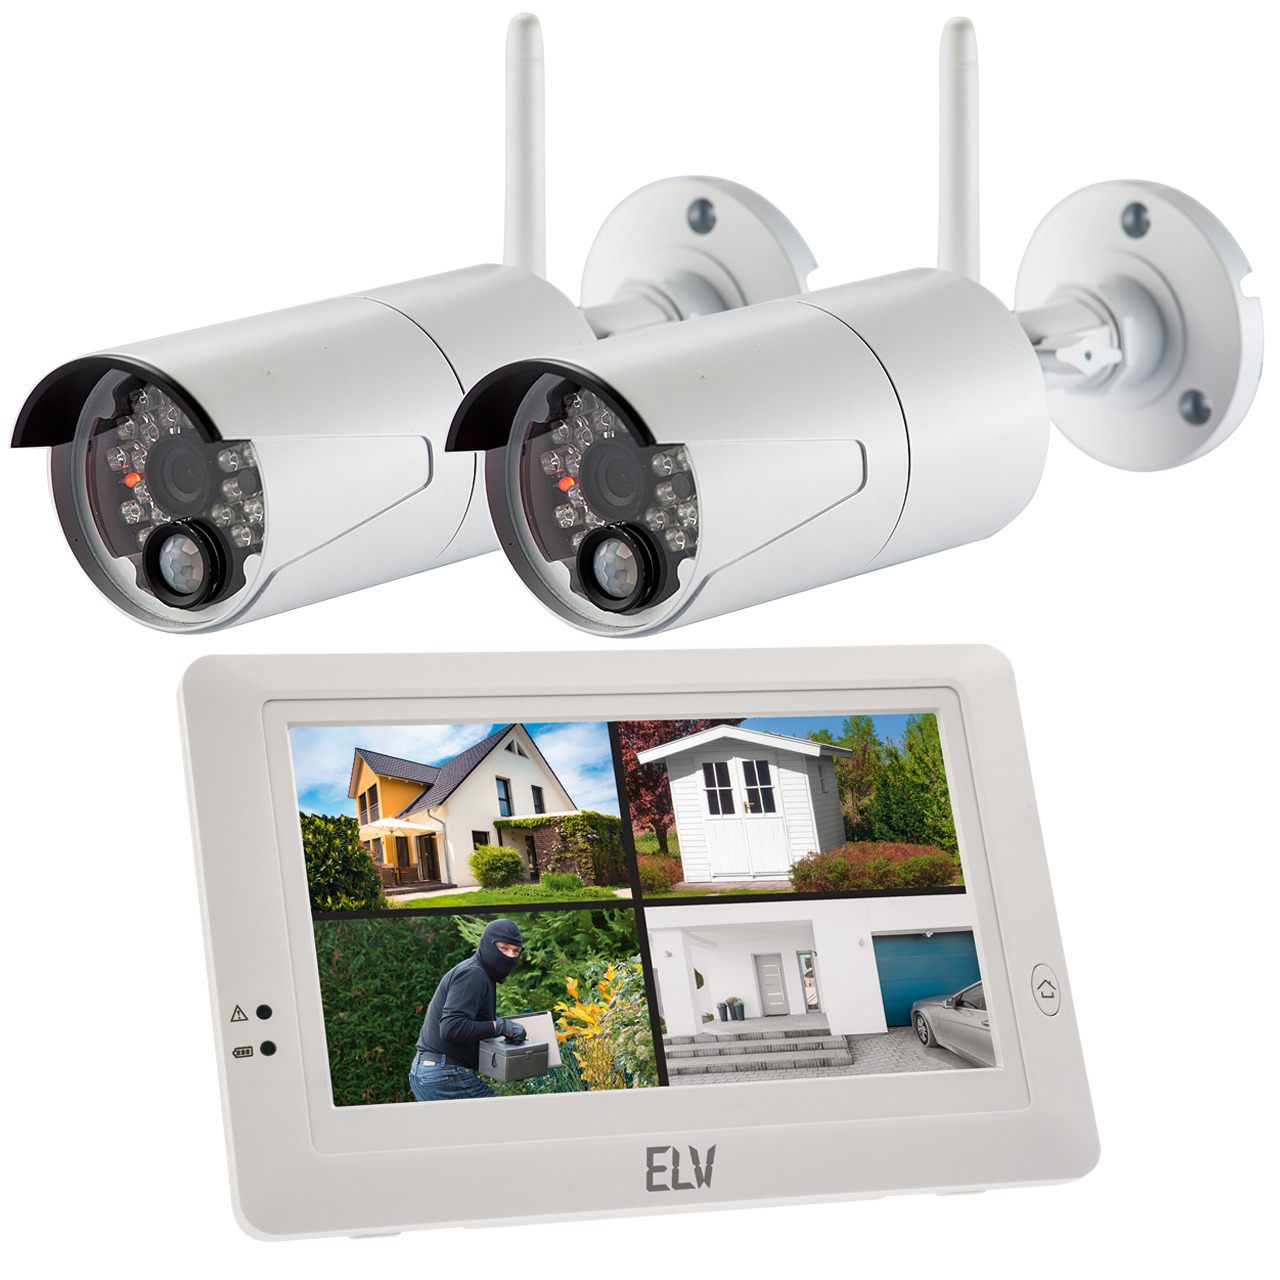 ELV Spar-Set Funk-Kamerasystem KS200 HD mit 2 Kameras- 720p- 2-4 GHz- mit App-Zugriff